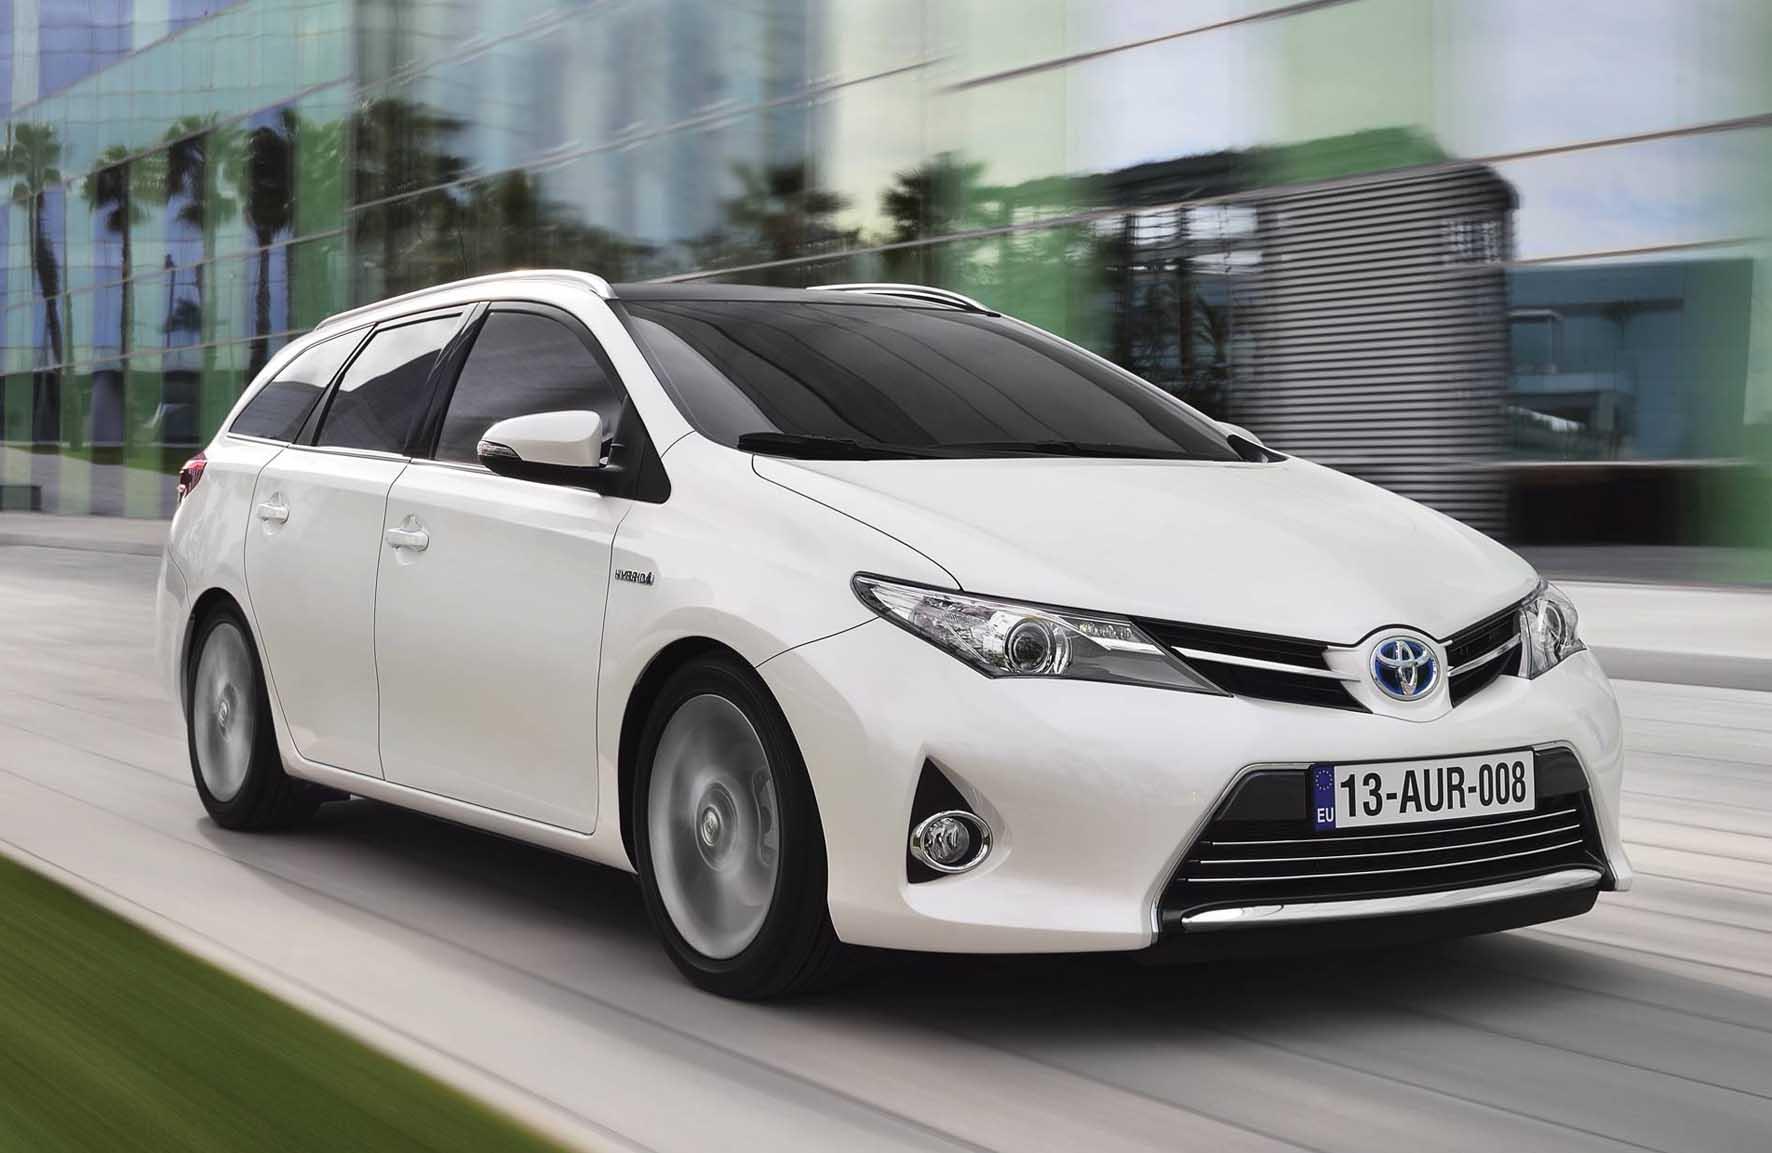 Toyota 2013 auris SW frontlat